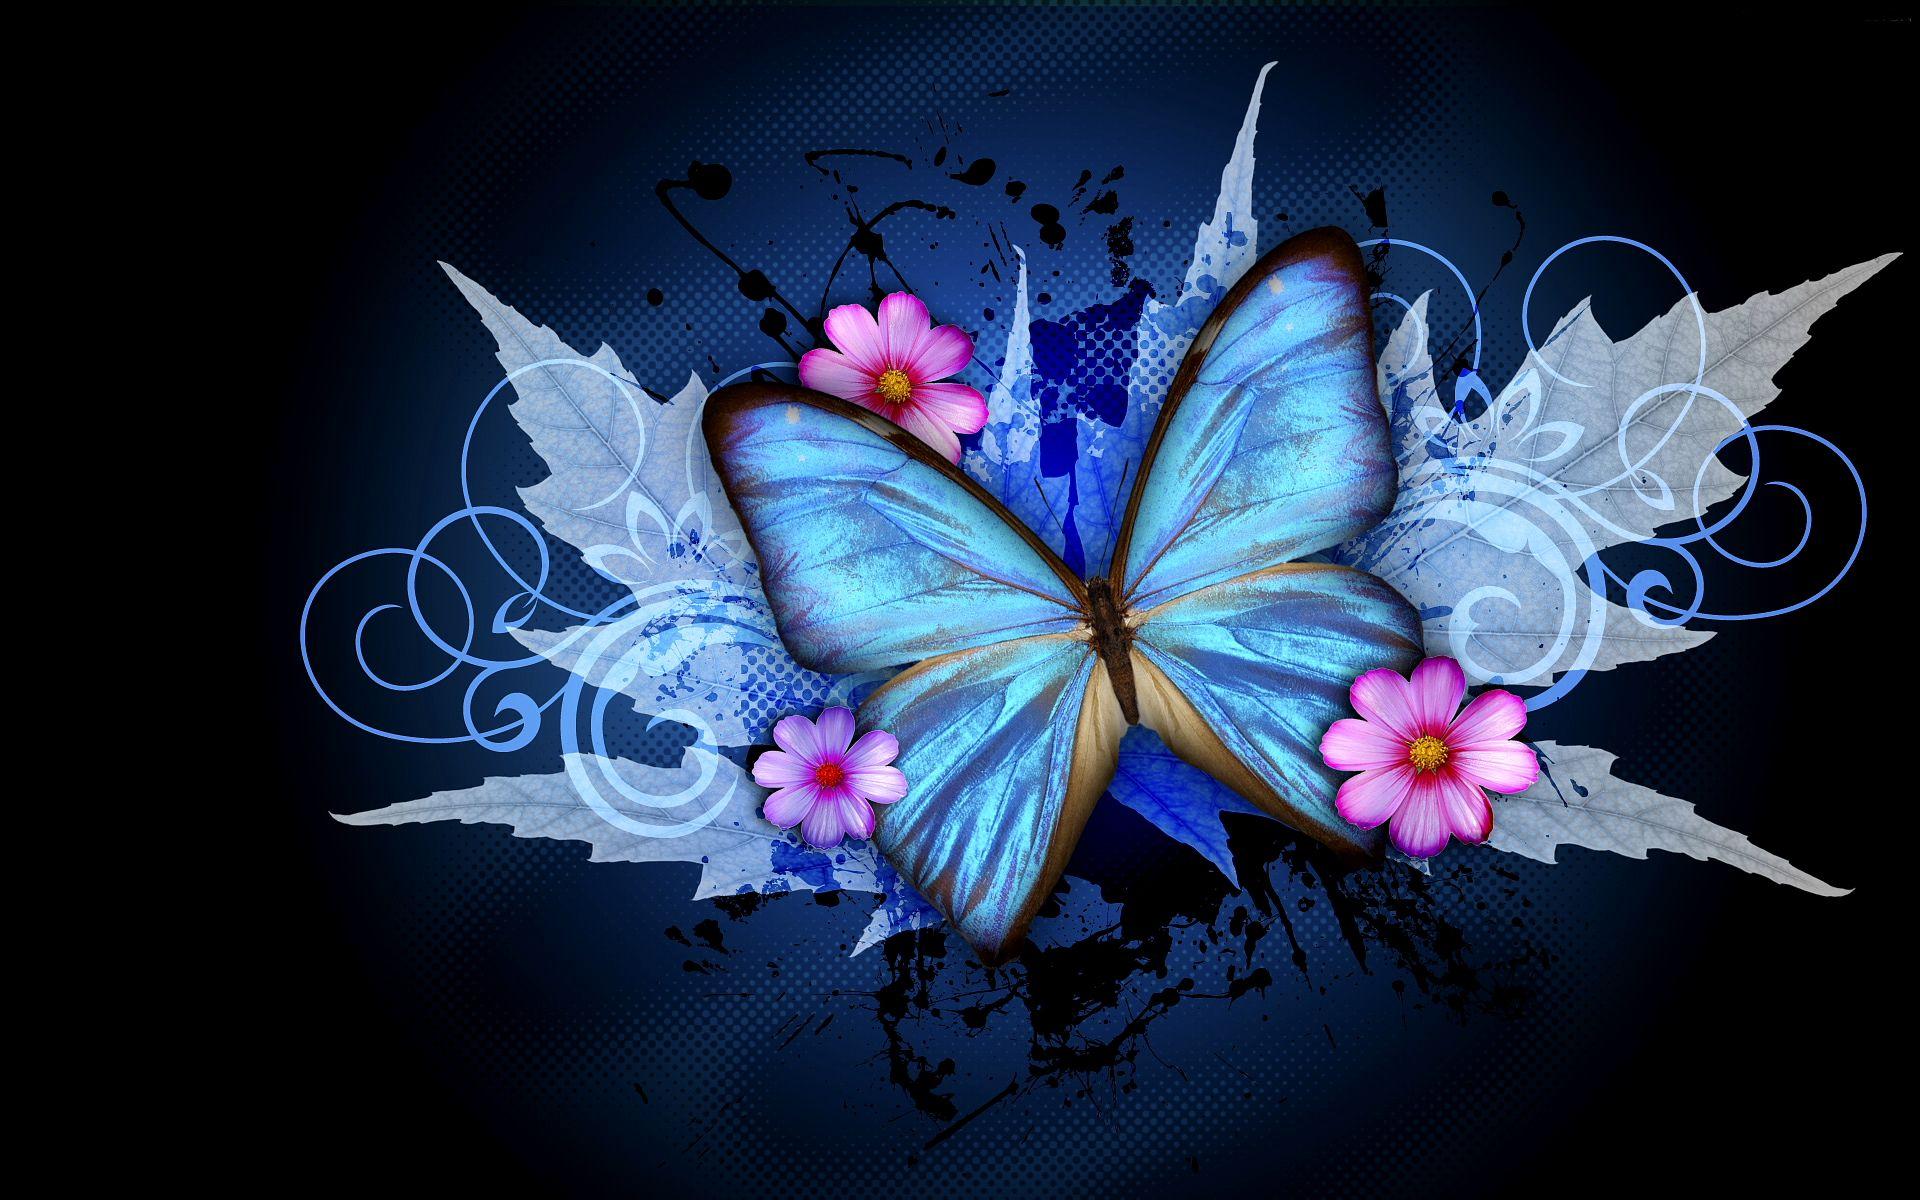 Blue and black butterflies wallpaper butterflies pinterest blue and black butterflies wallpaper biocorpaavc